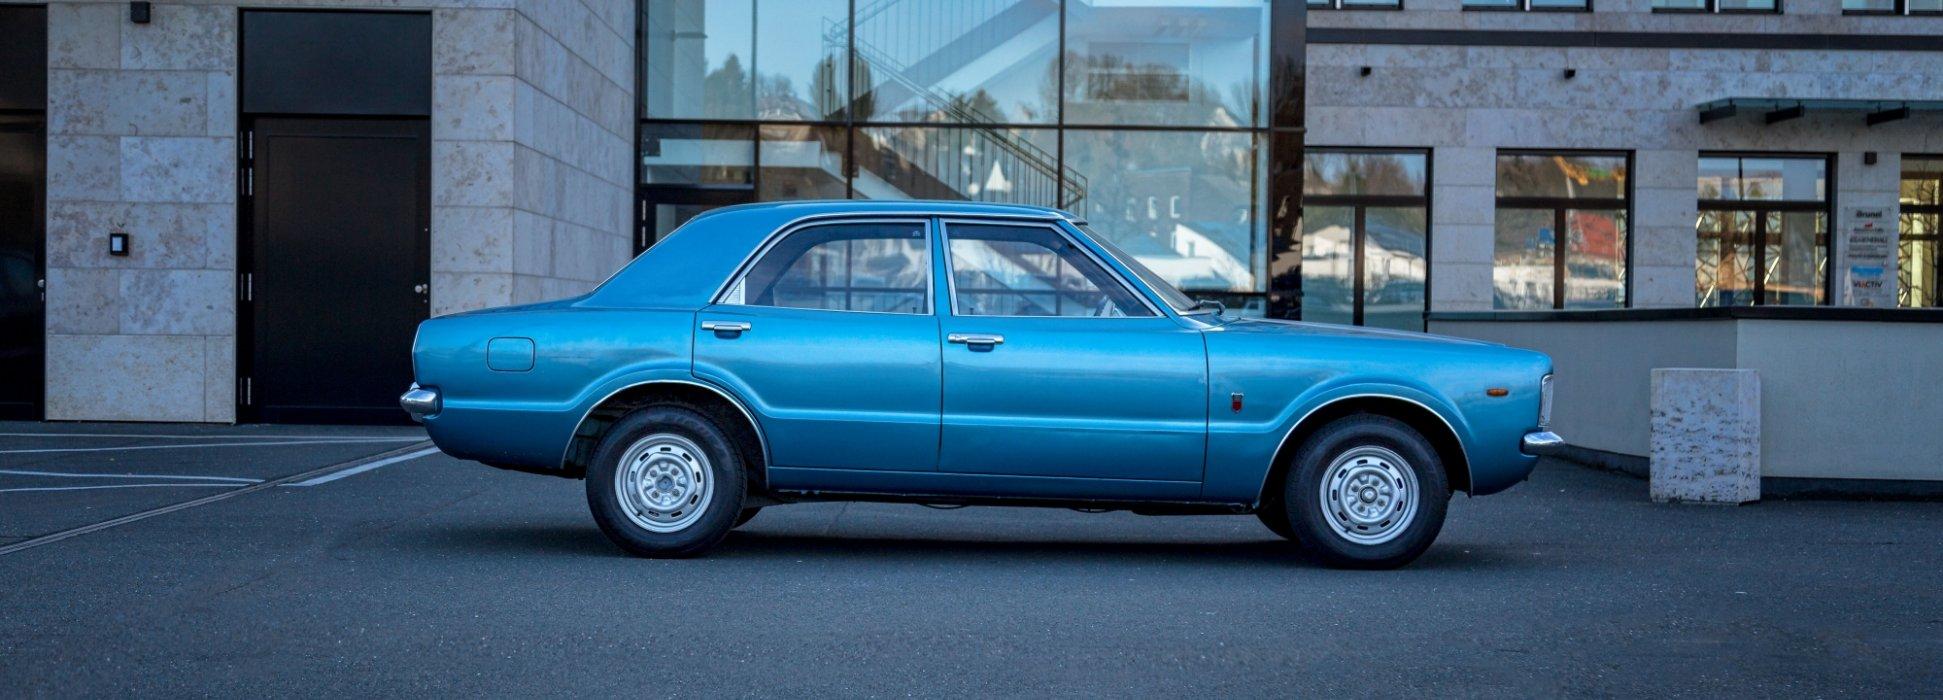 Ford Taunus XL 1300 1